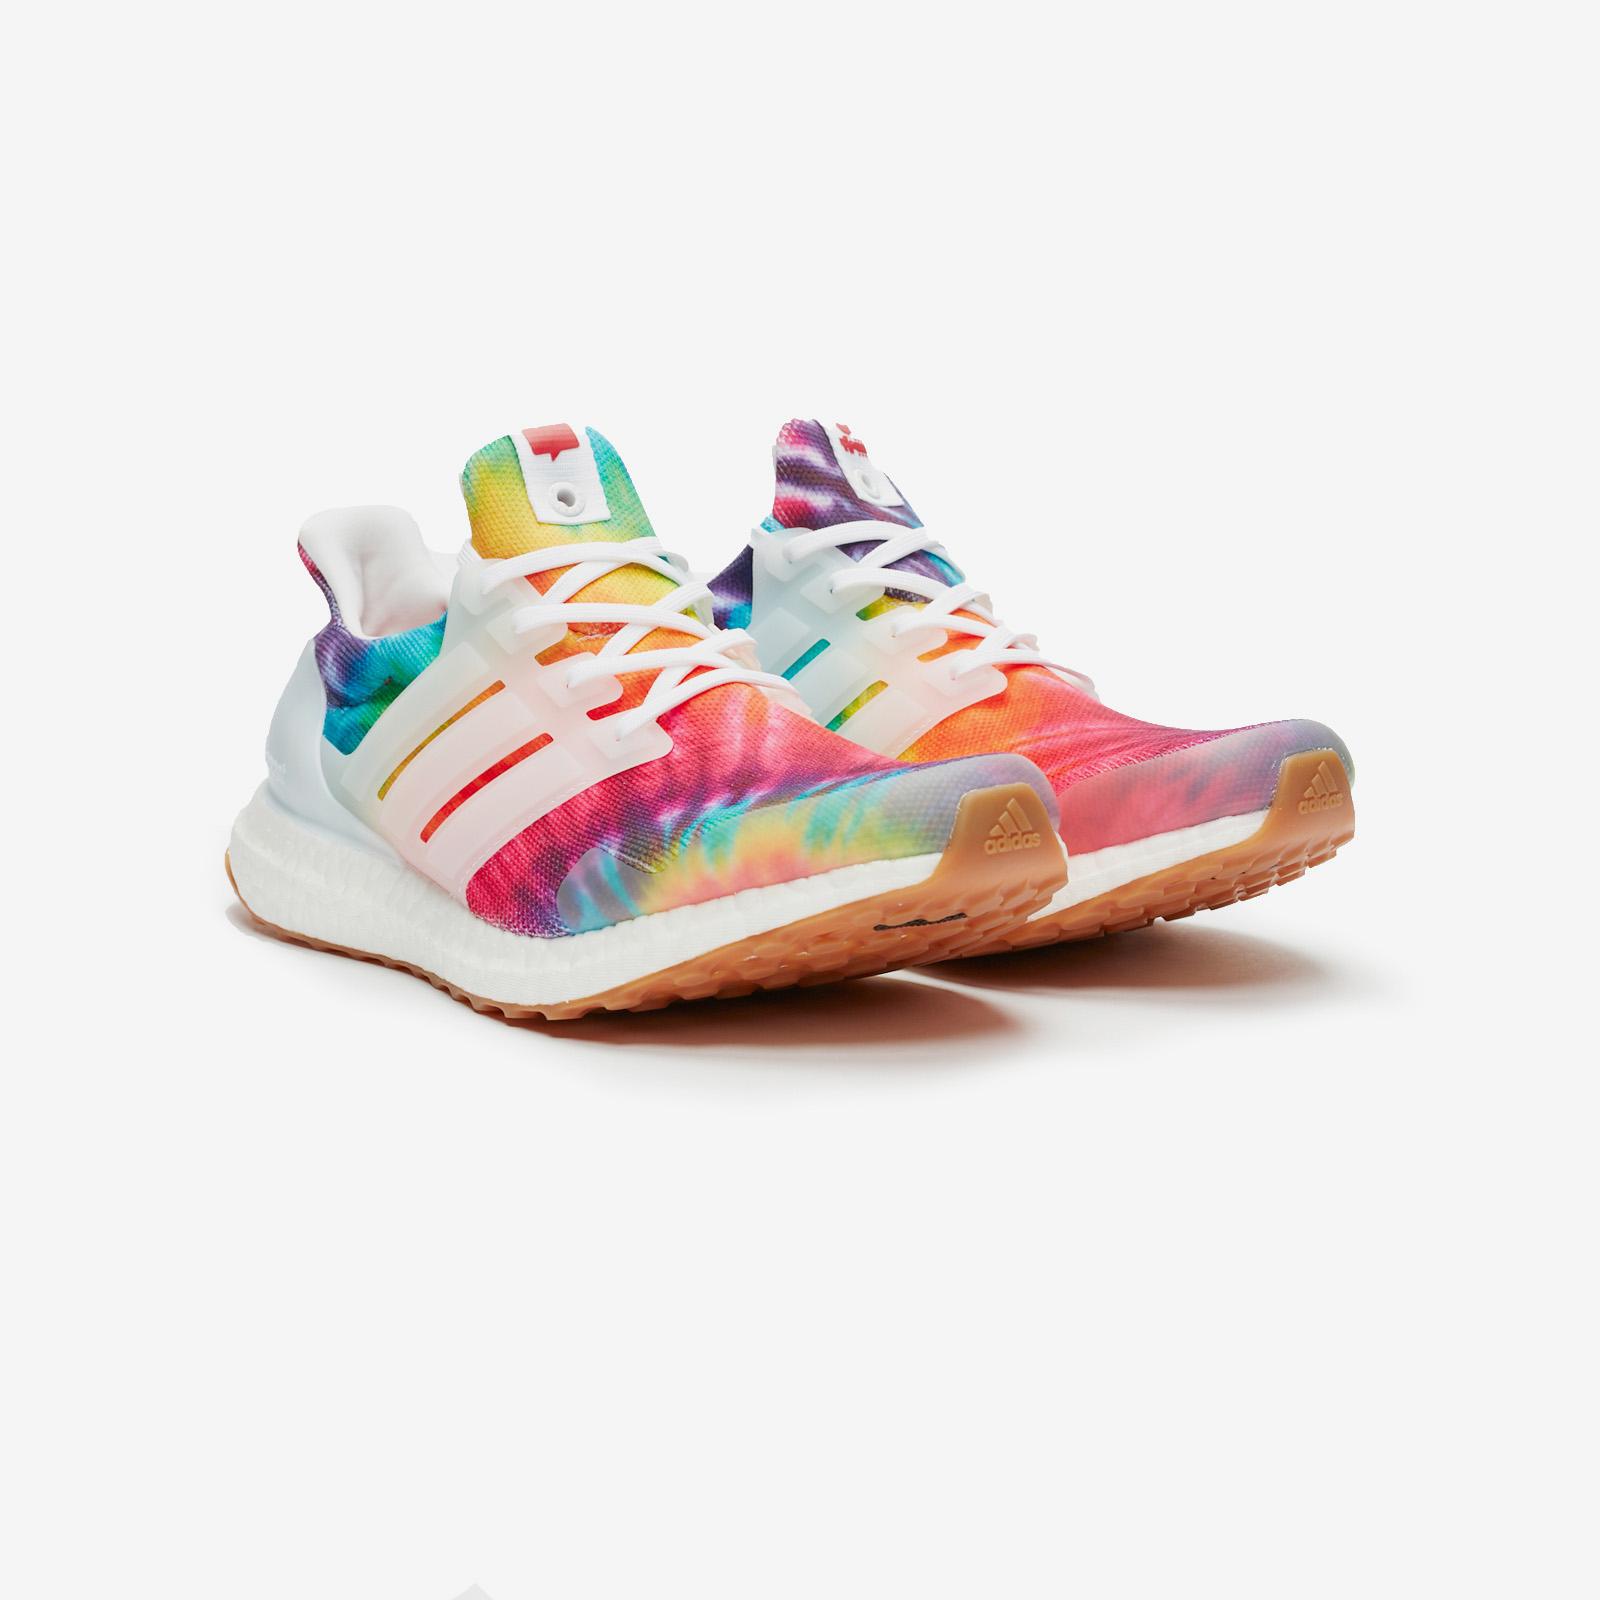 adidas UltraBOOST x Nice Kicks Ef7775 Sneakersnstuff